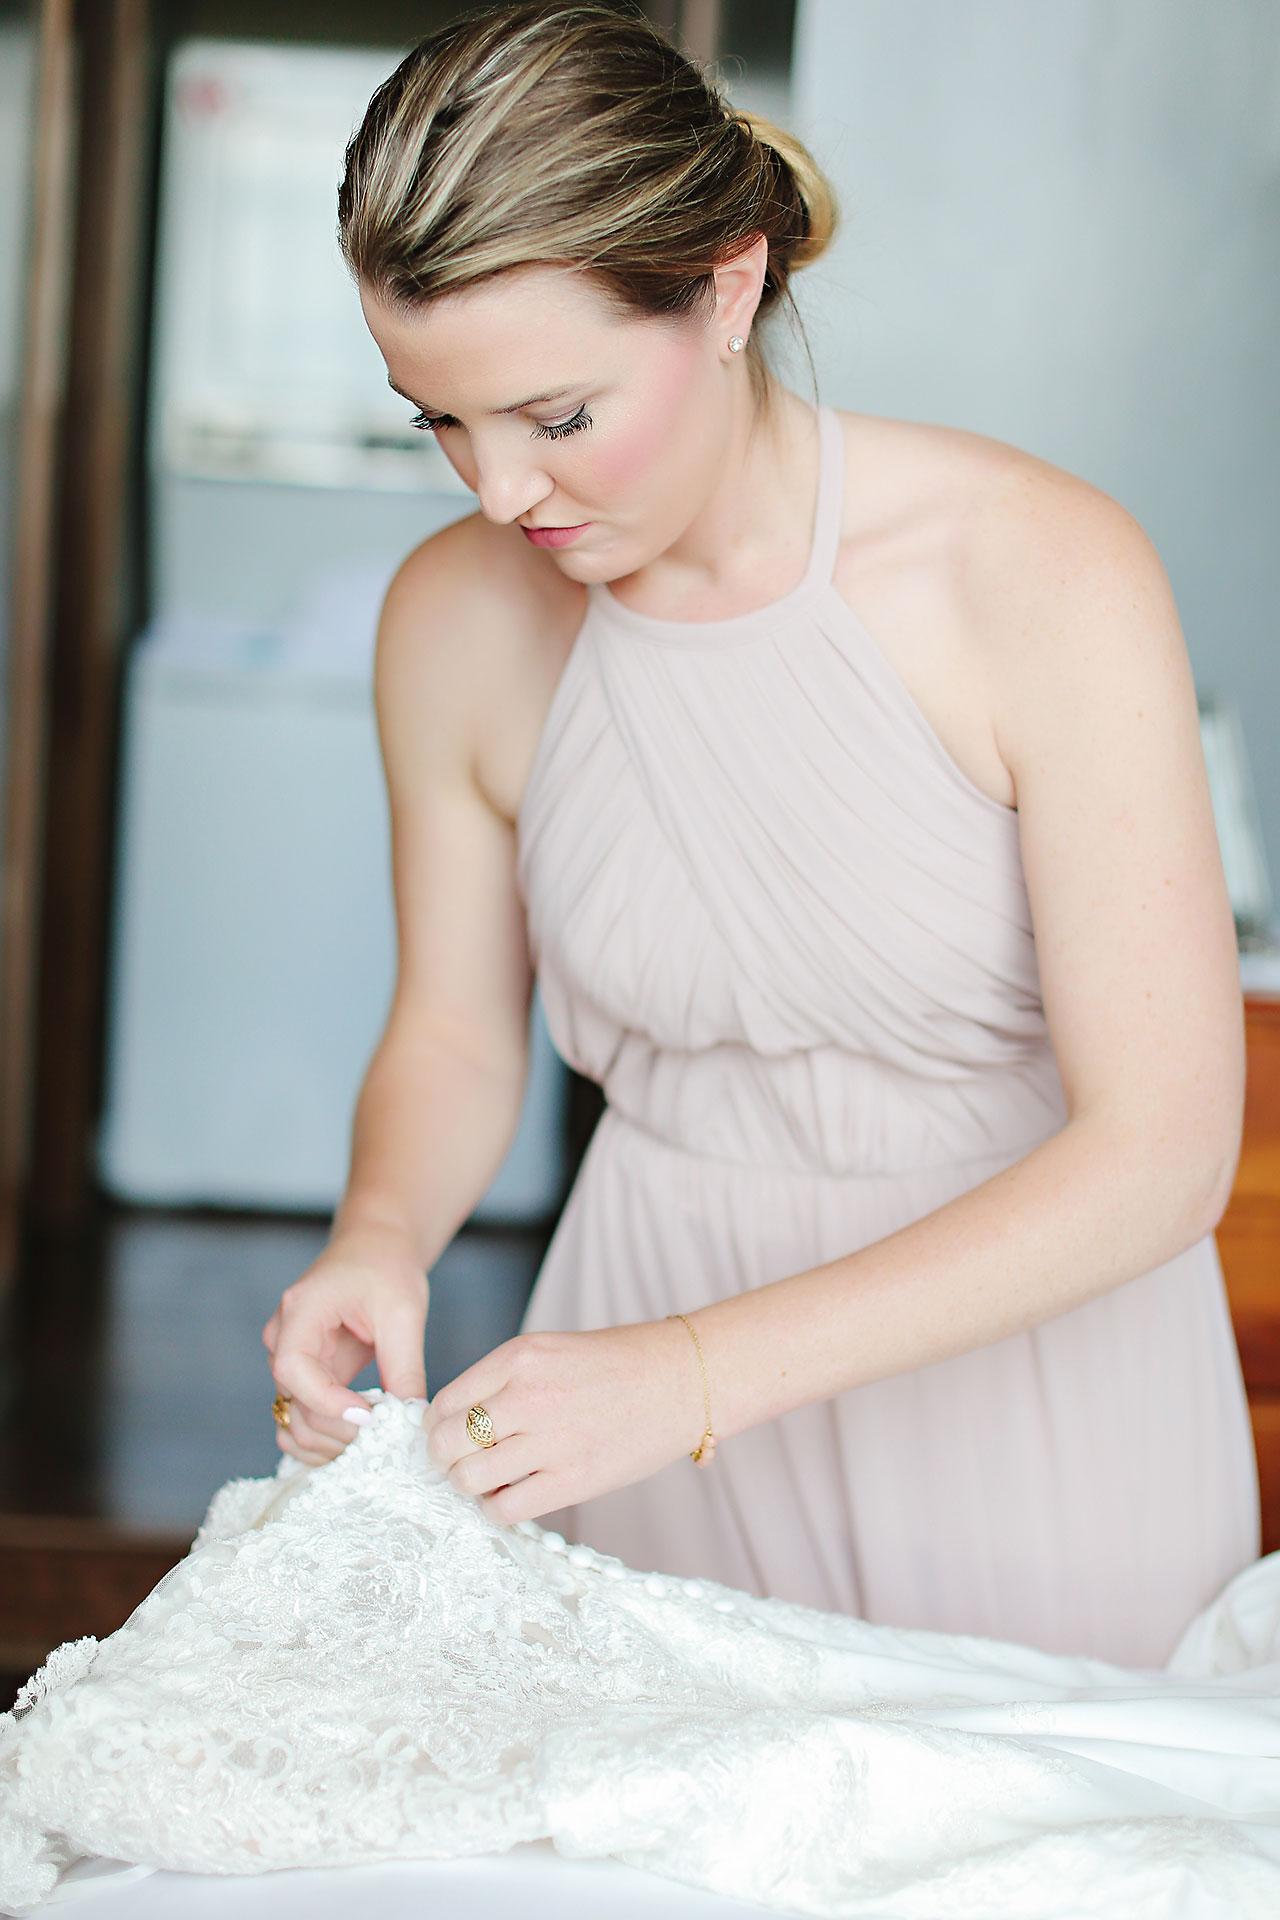 Molly Declan Scottish Rite Indianapolis Wedding 024